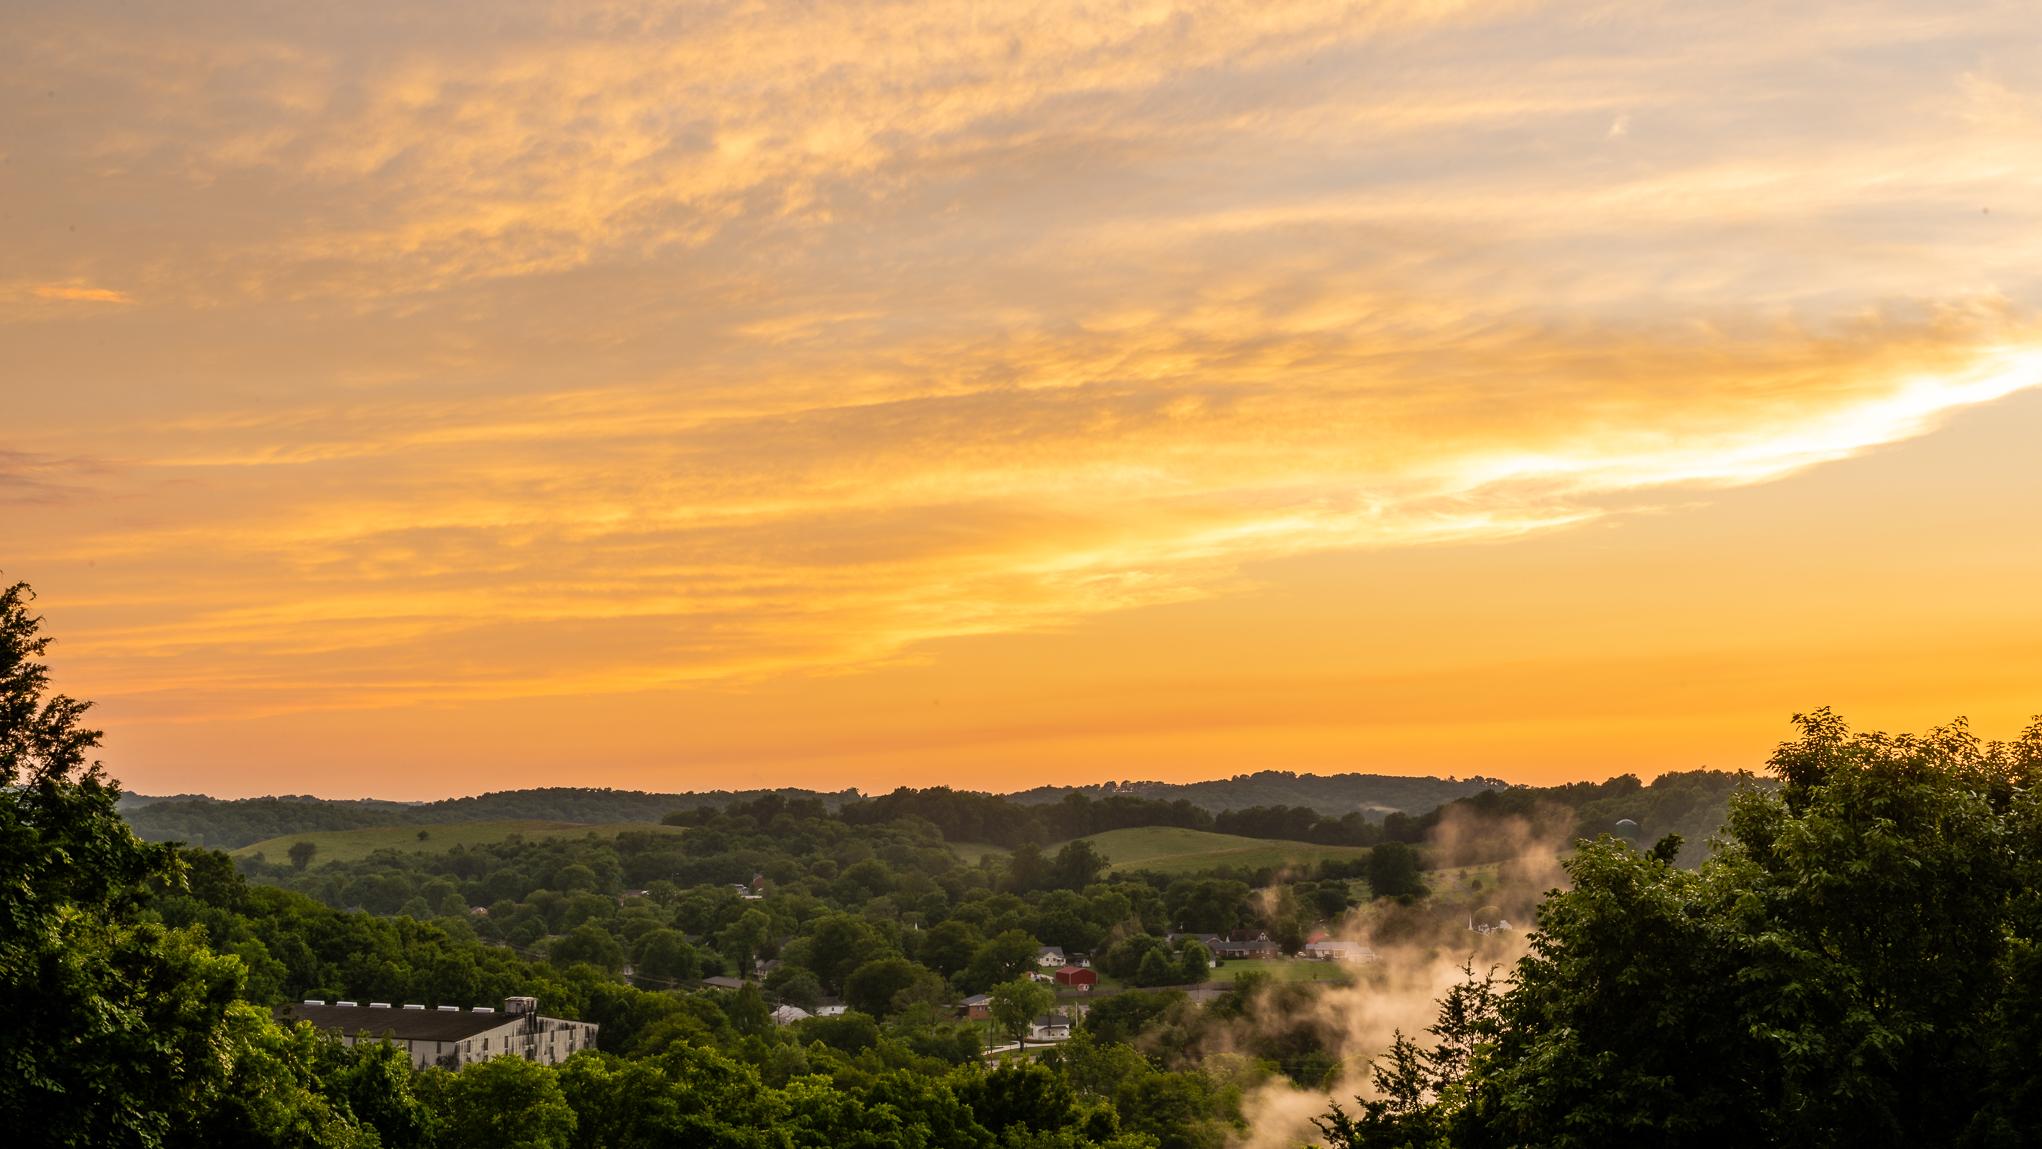 Nashville Photographer Jack Daniels Landscape.jpg